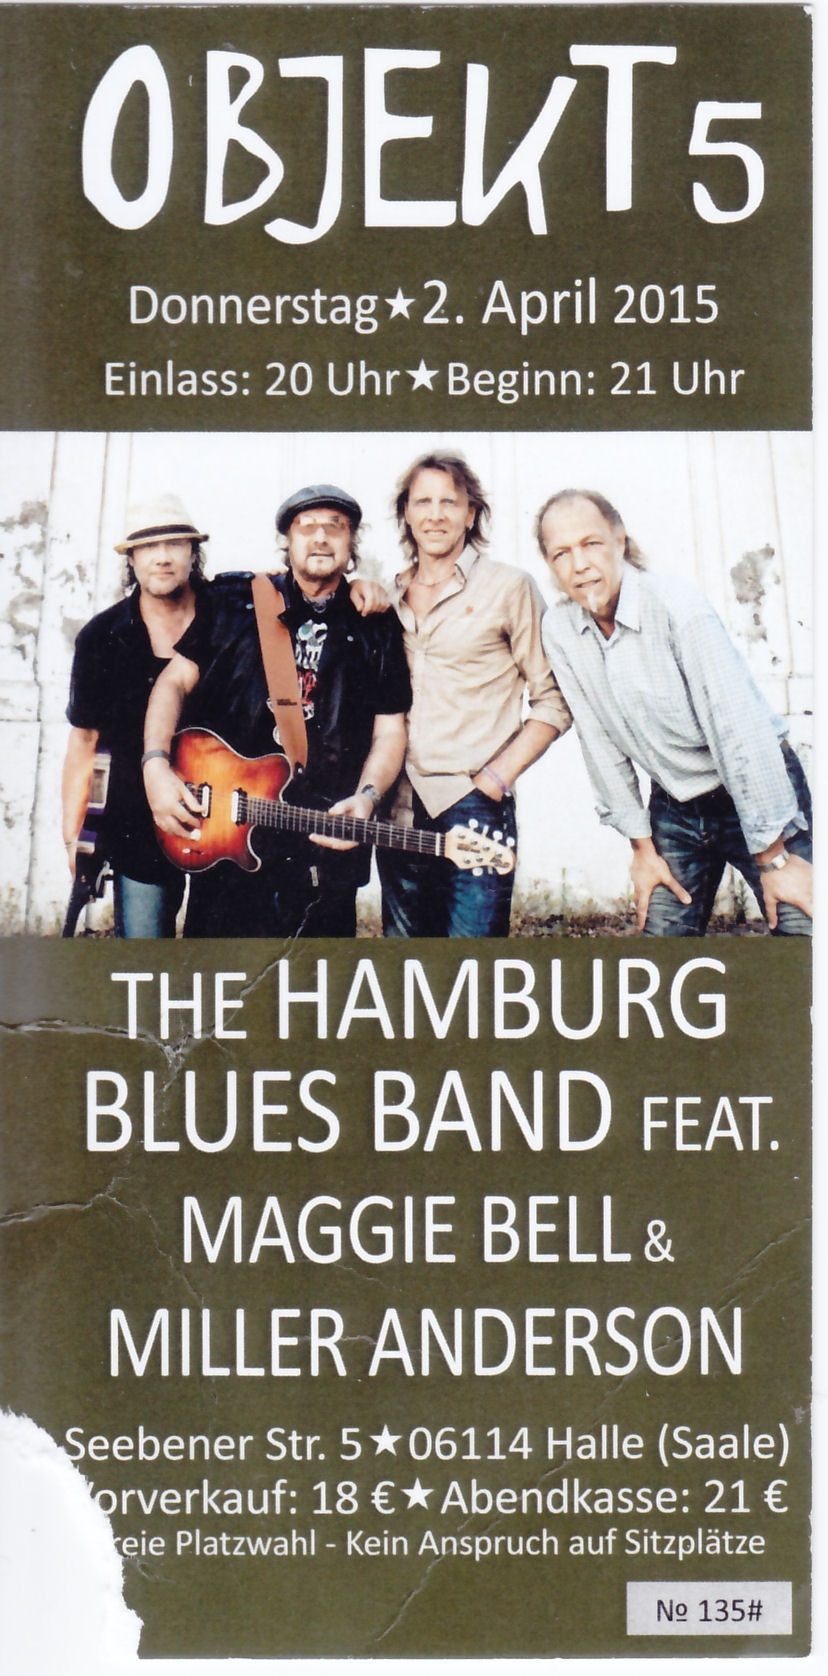 MaggieBellMillerAnderson2015-04-02Objekt5HalleSaaleGermany.jpg